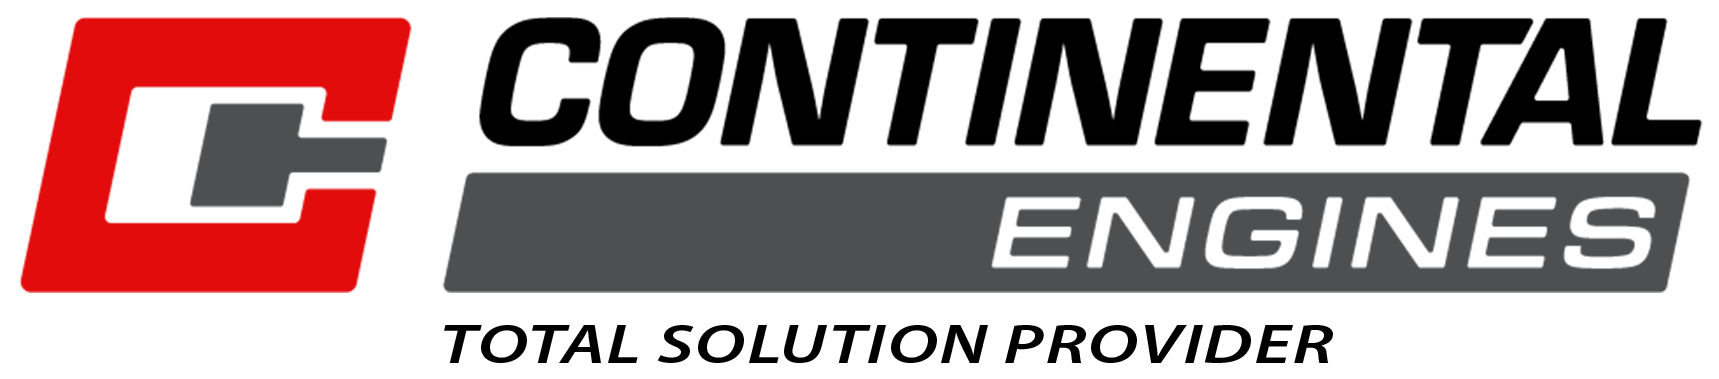 ROB20B-32611-J0